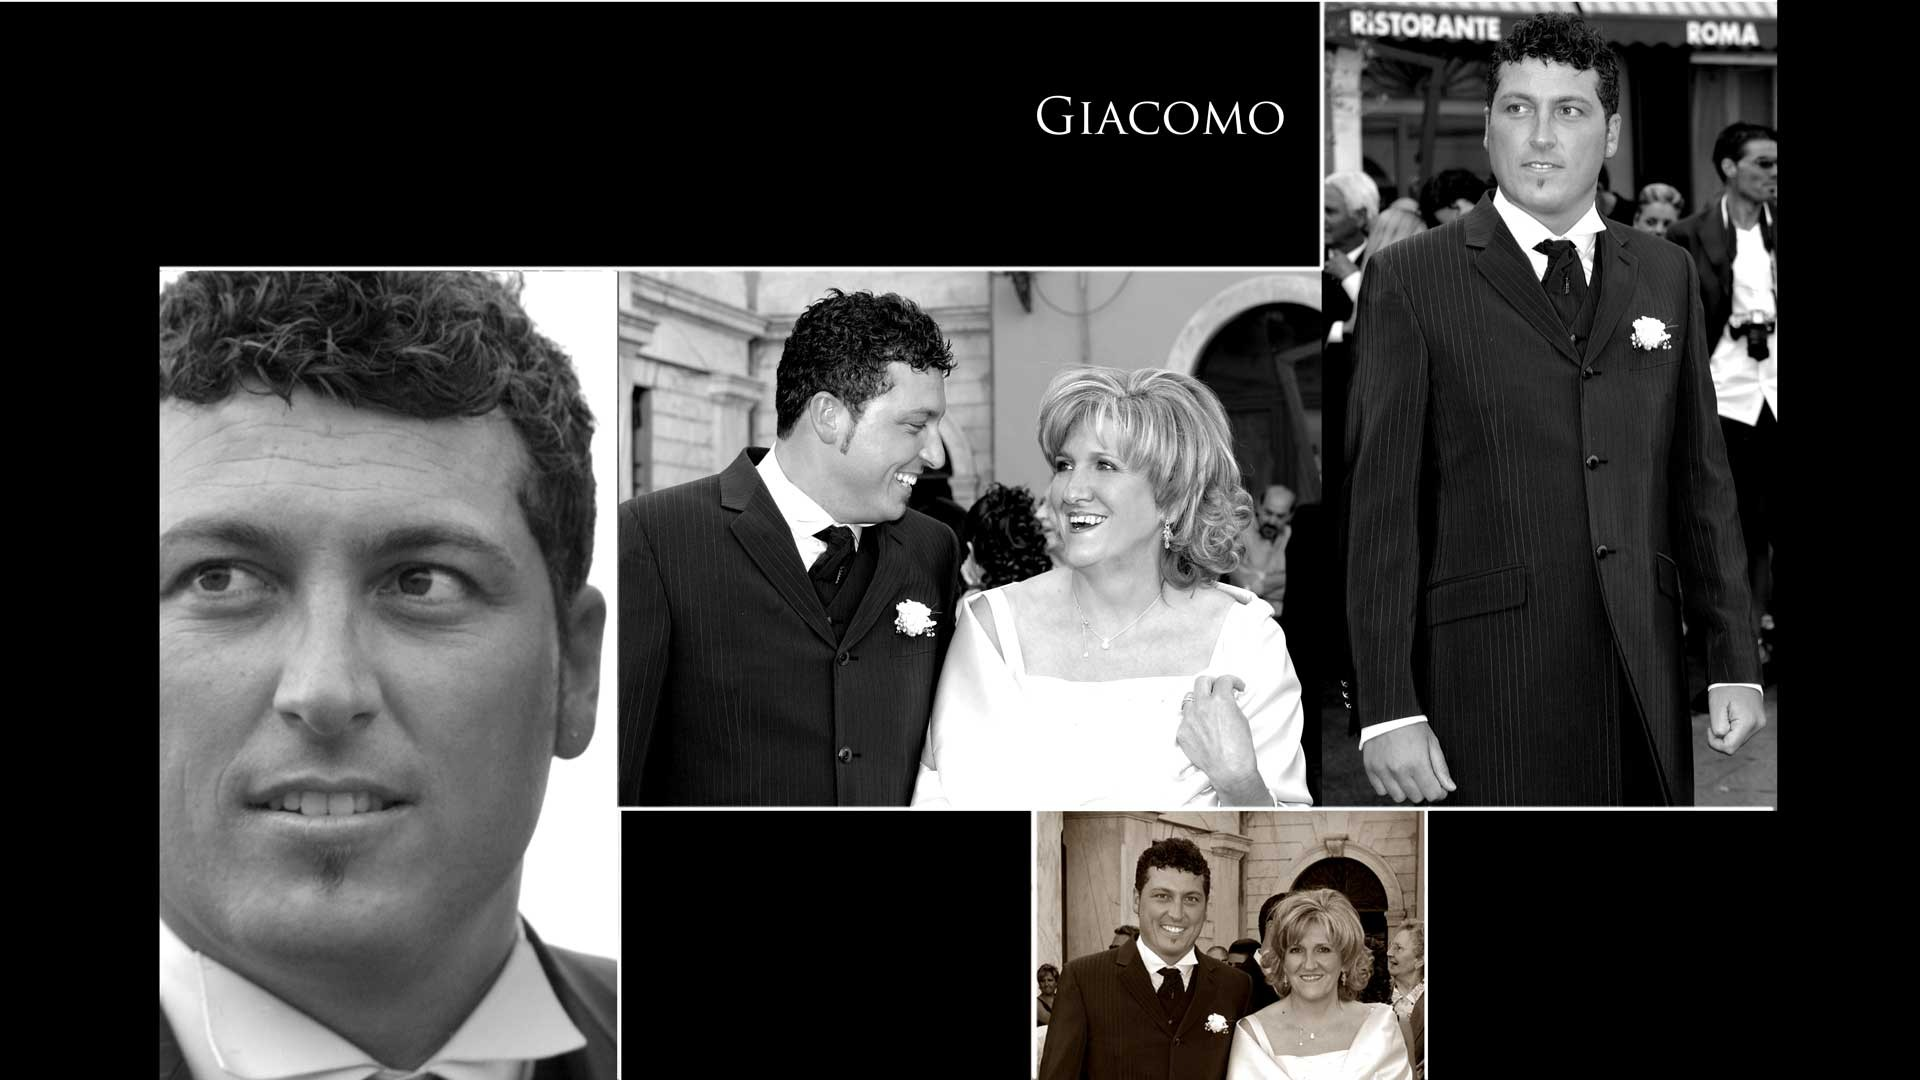 Foto sposi Micaela e Giacomo